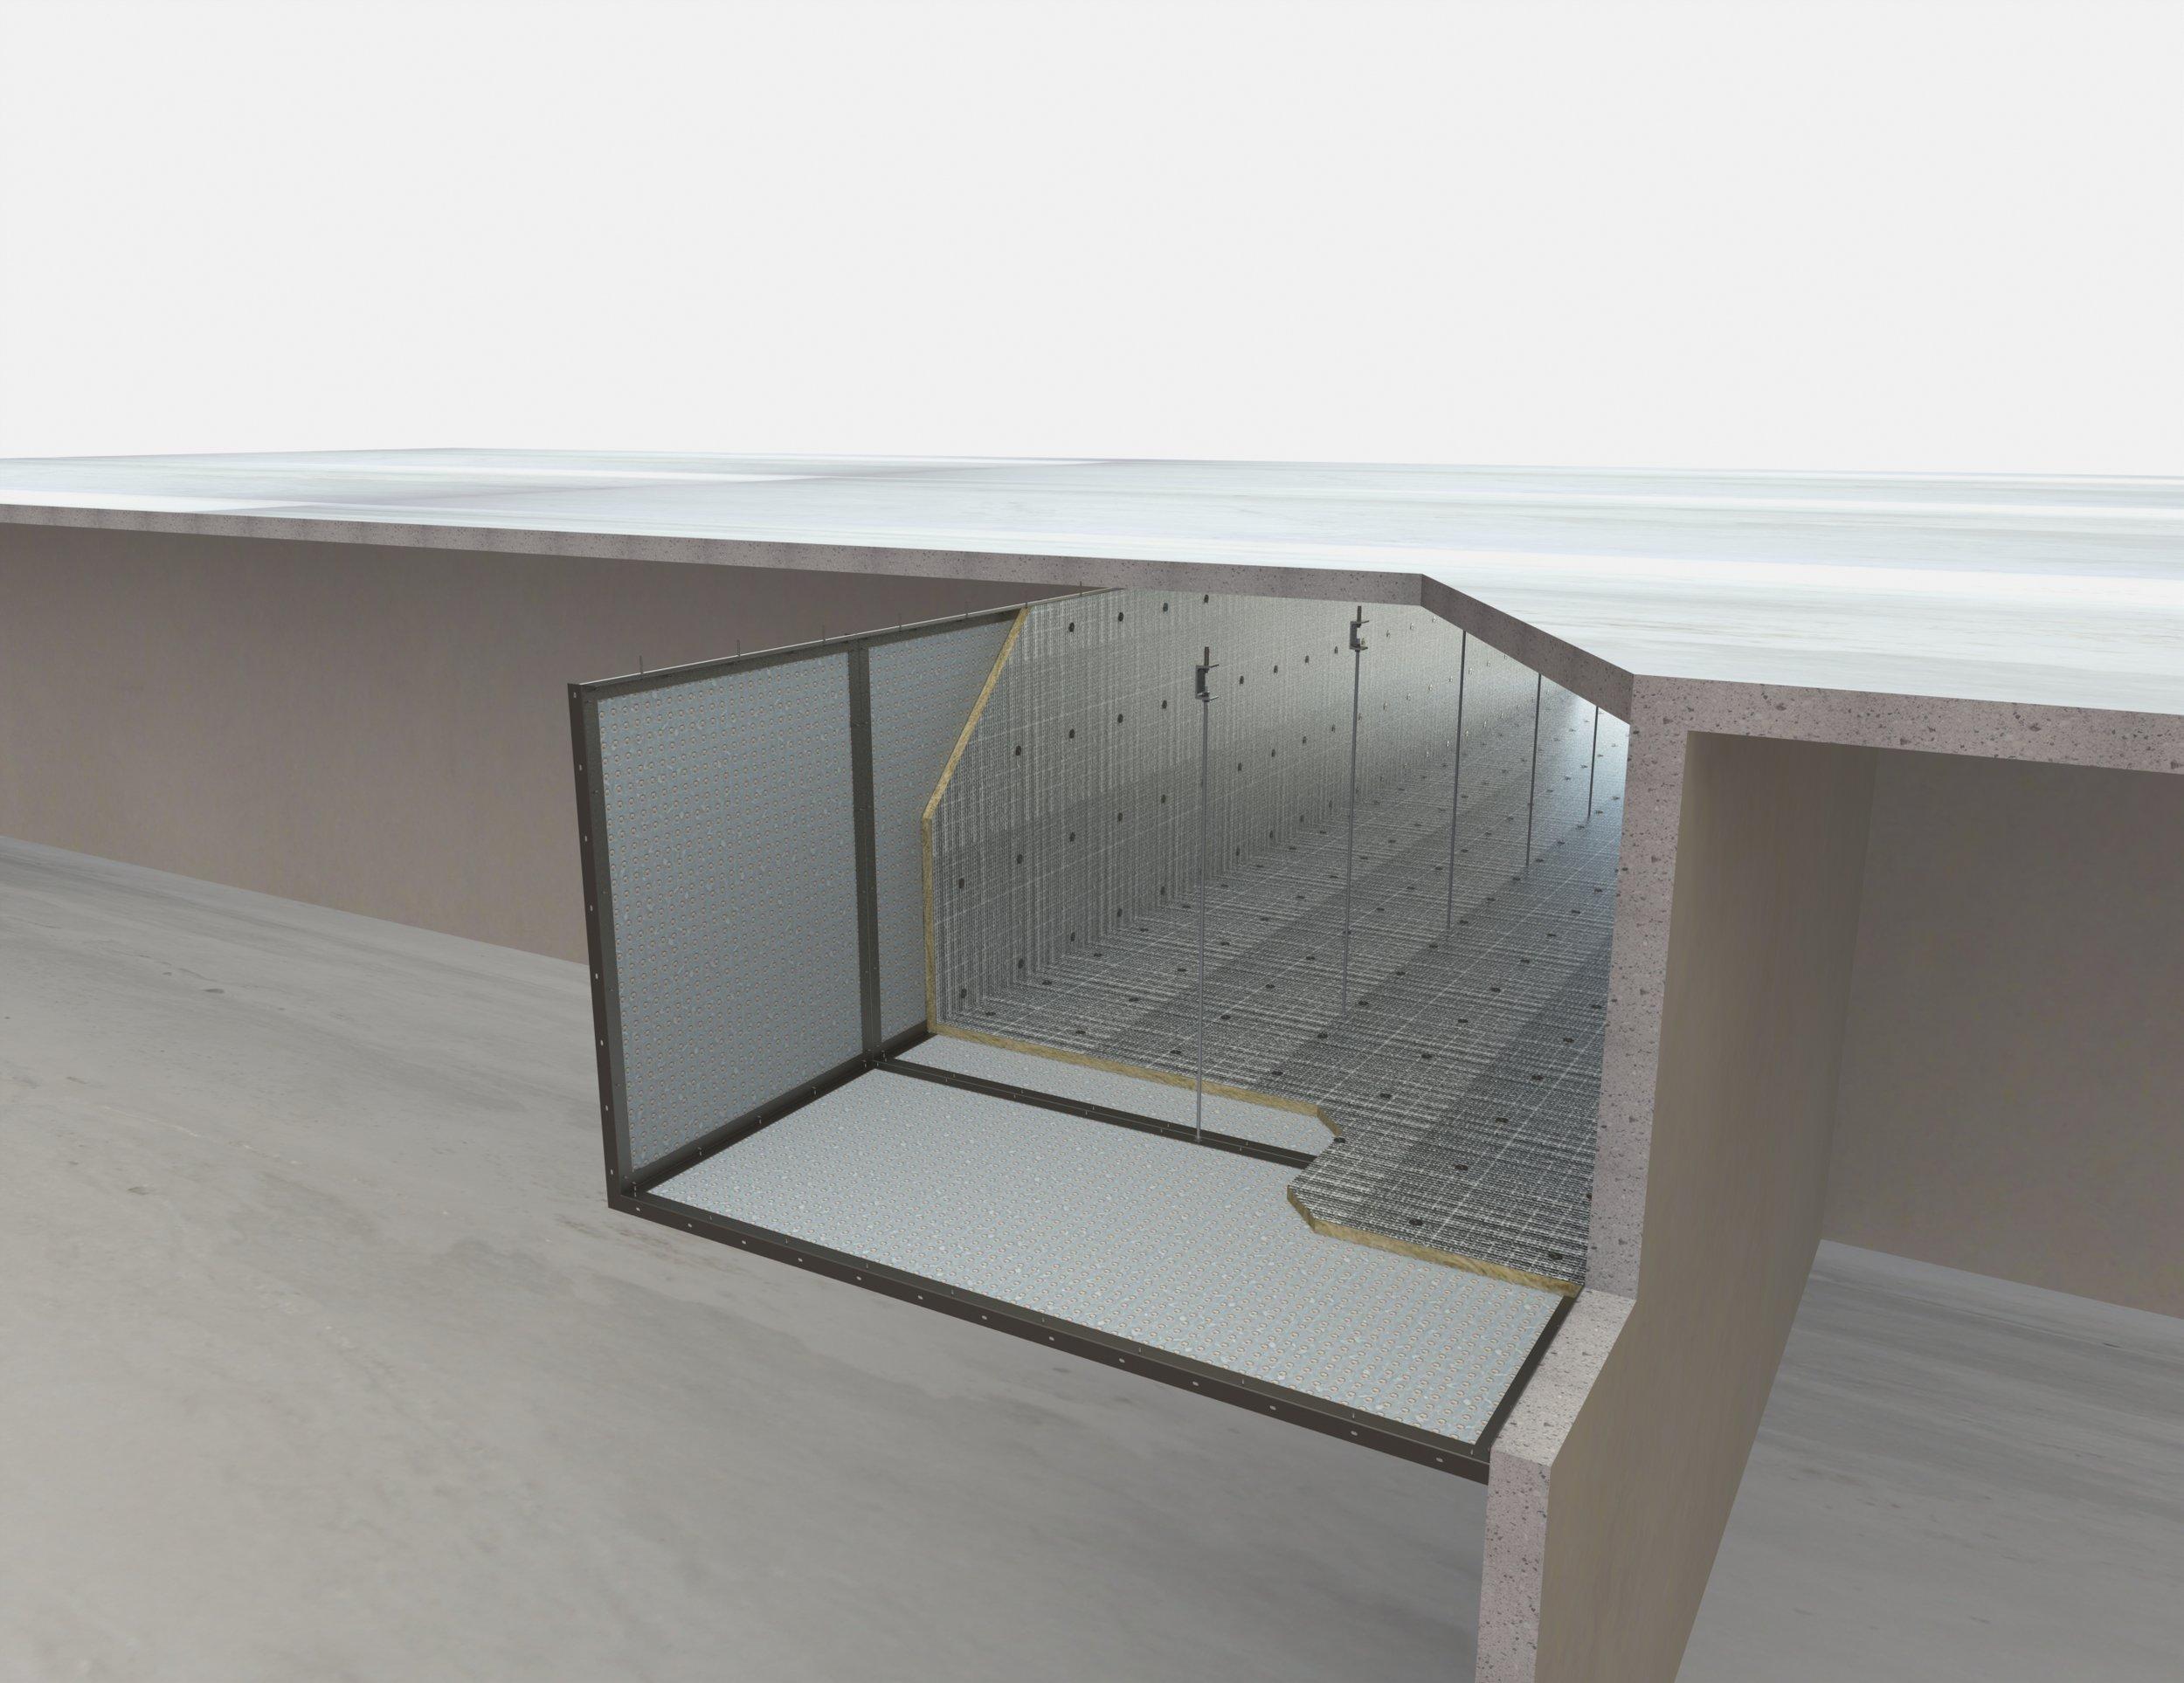 Internal insulation c 10 B without mesh 0113 texture 1 exposure 1-1 input white.JPG